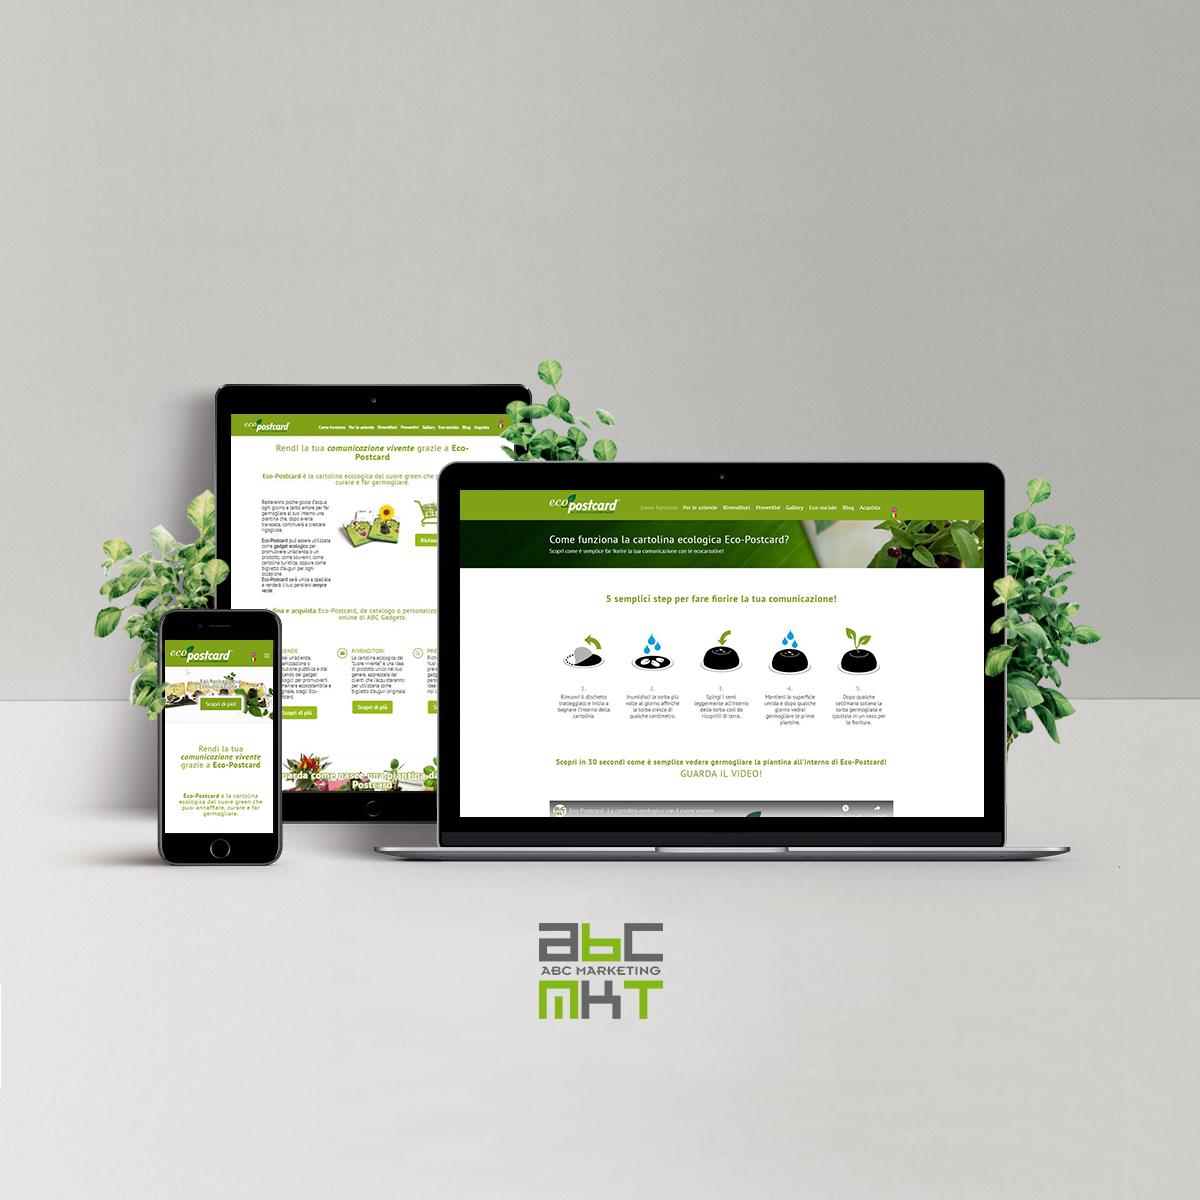 eco-postcard sito IG